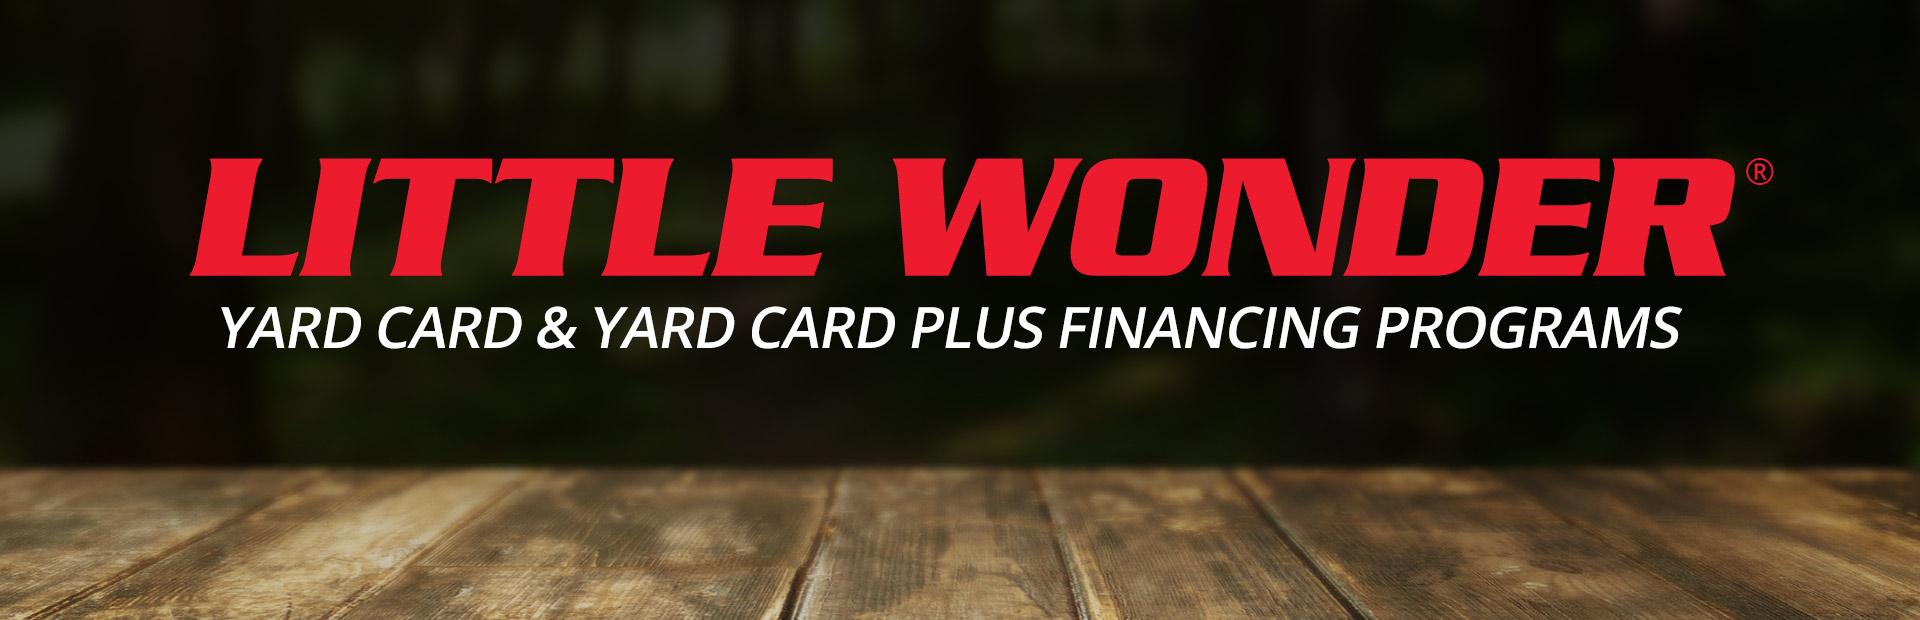 Little Wonder: Yard Card And Yard Card Plus Financing Programs